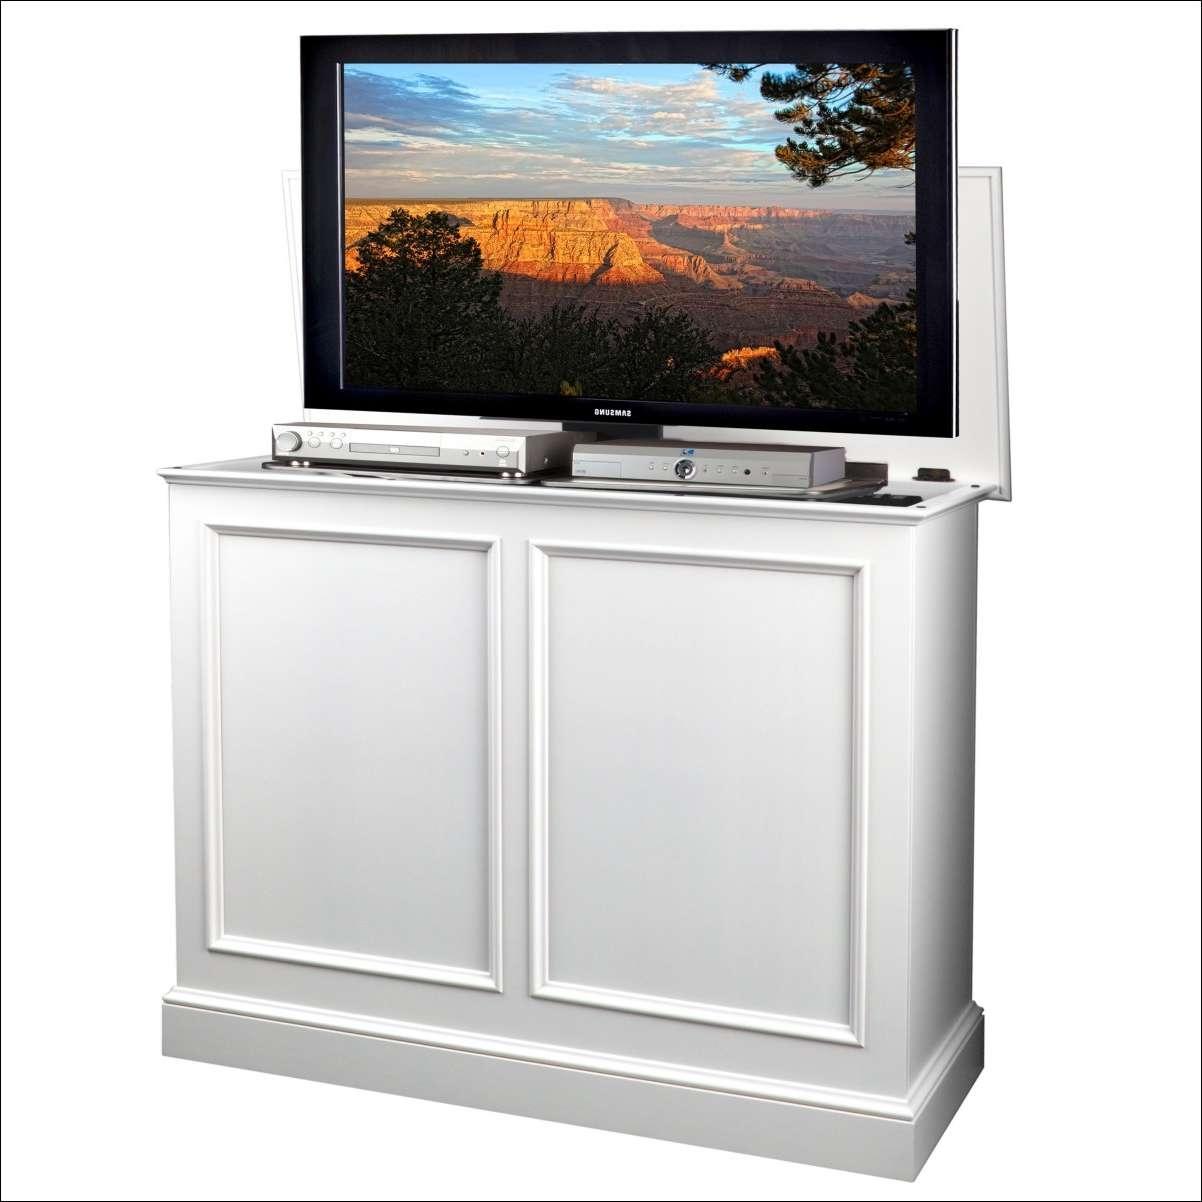 Living Room : Marvelous Under Bed Tv Lift Mechanism Hidden Tv Lift Inside Pop Up Tv Stands (View 18 of 20)